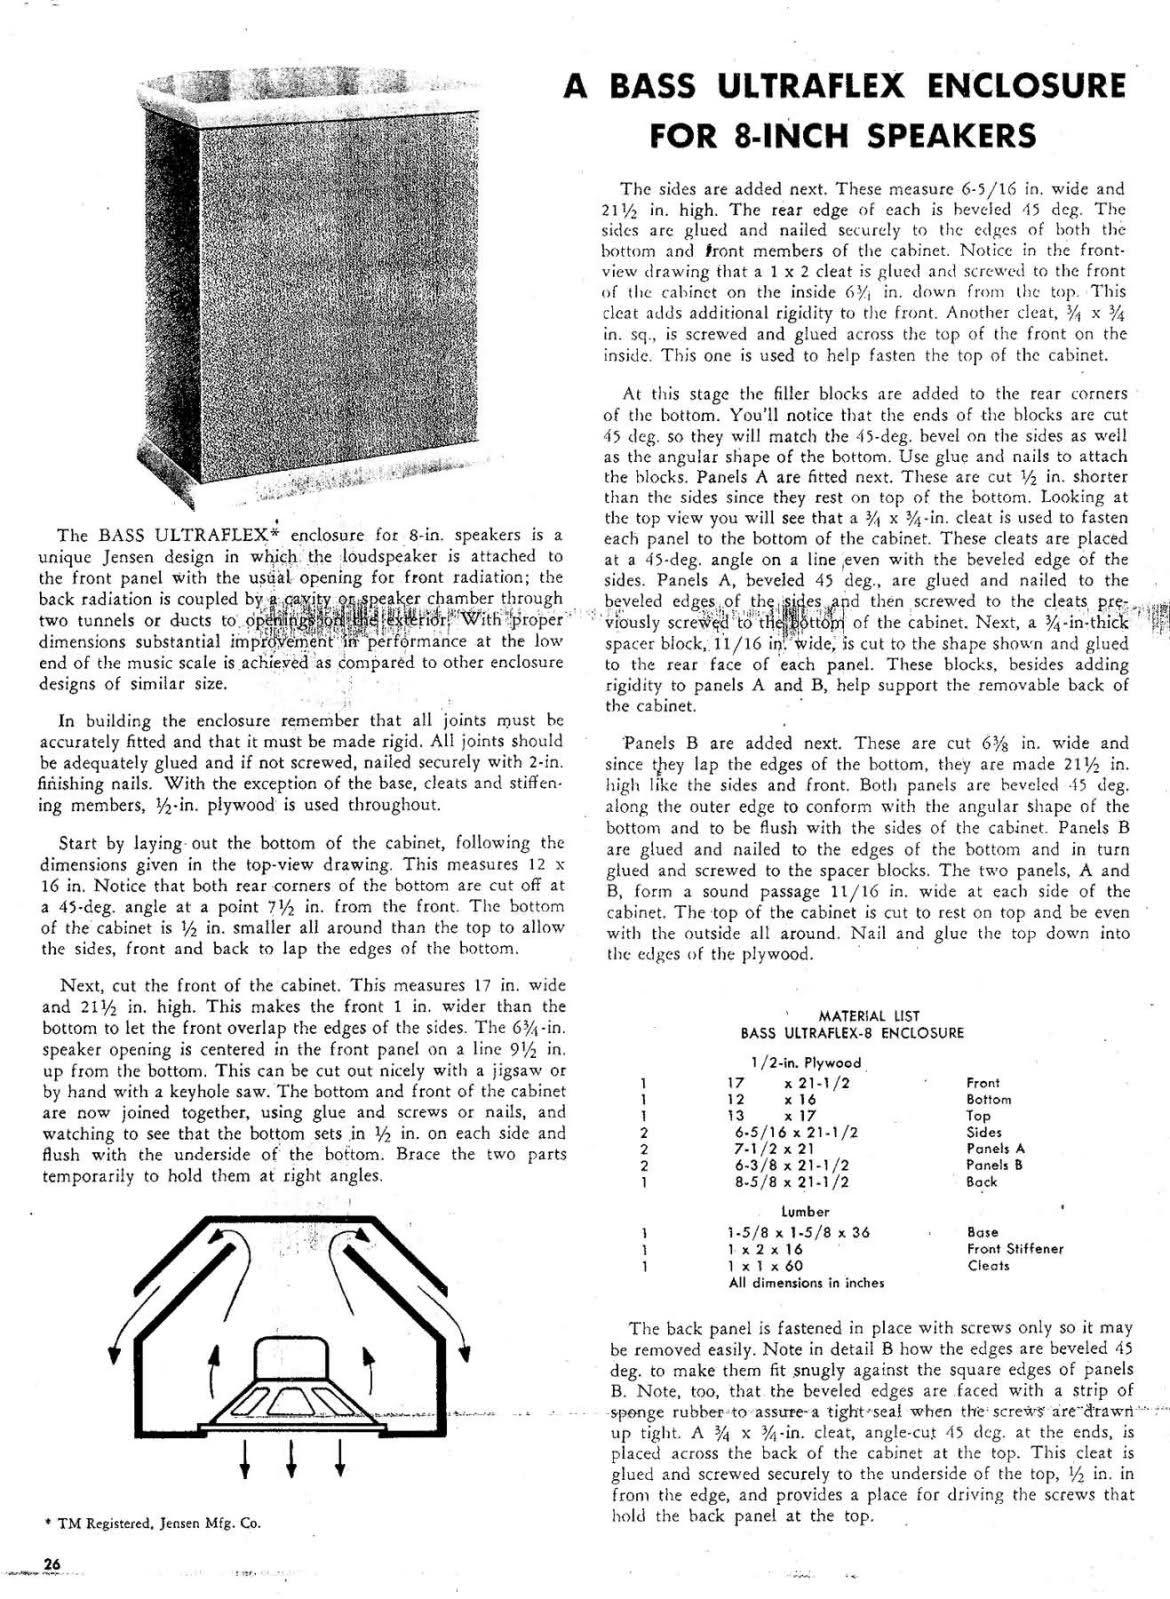 Je Labs Jensen Ultraflex Cabinet For 8 Speaker